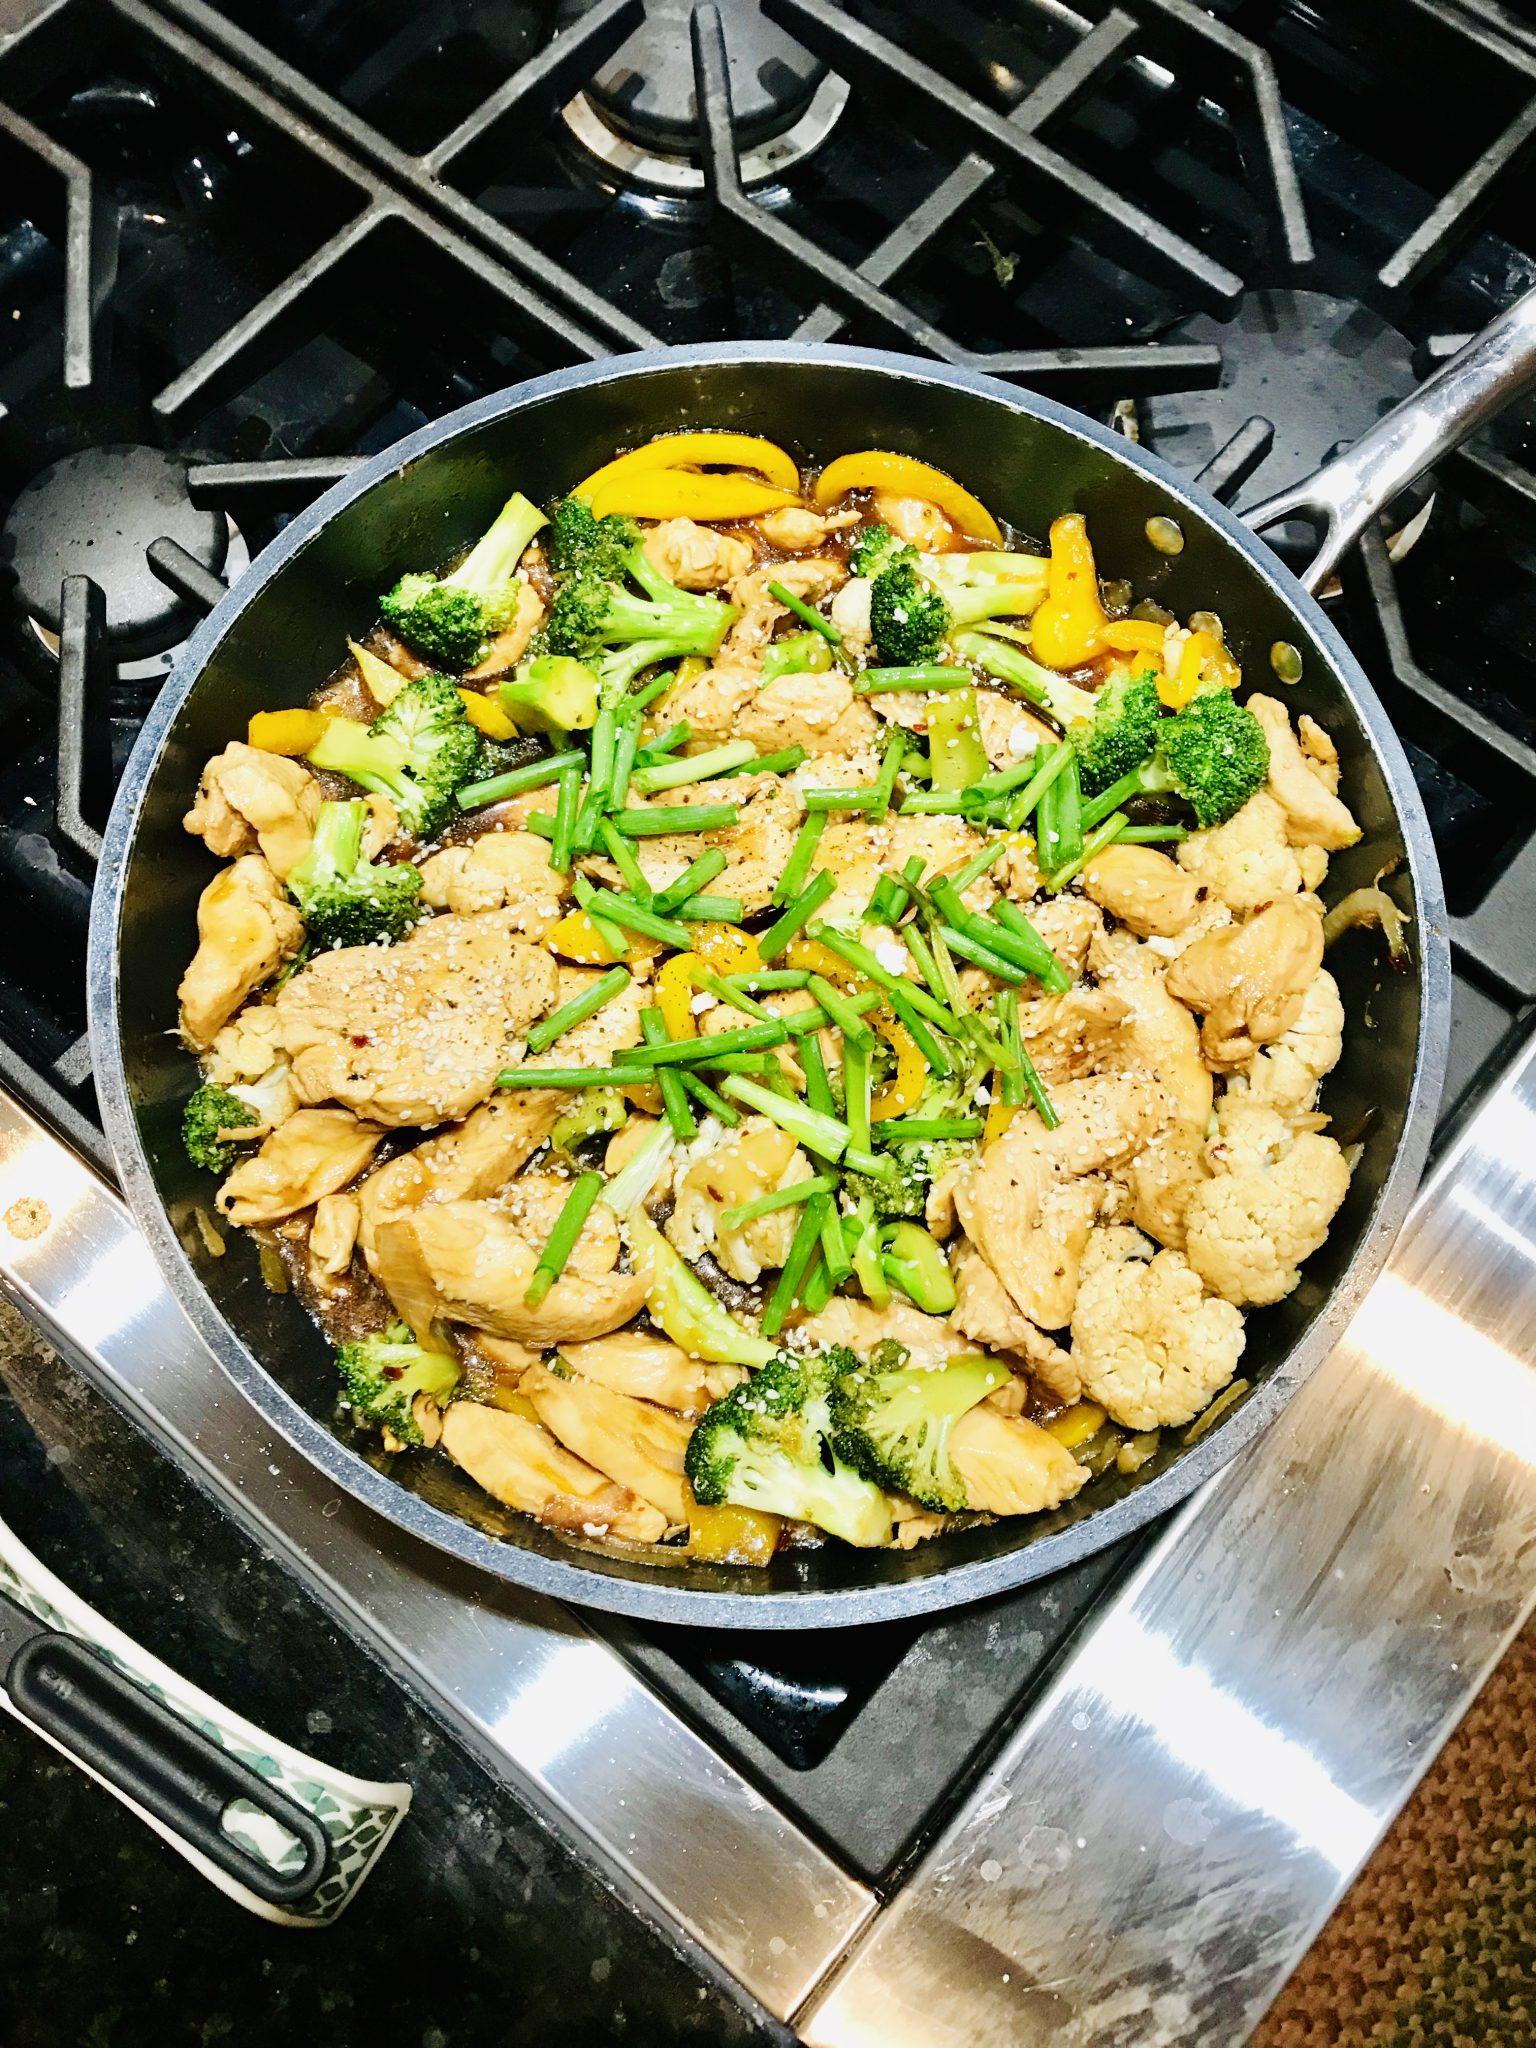 Yummy! The Best Teriyaki Chicken Stir Fry Recipe